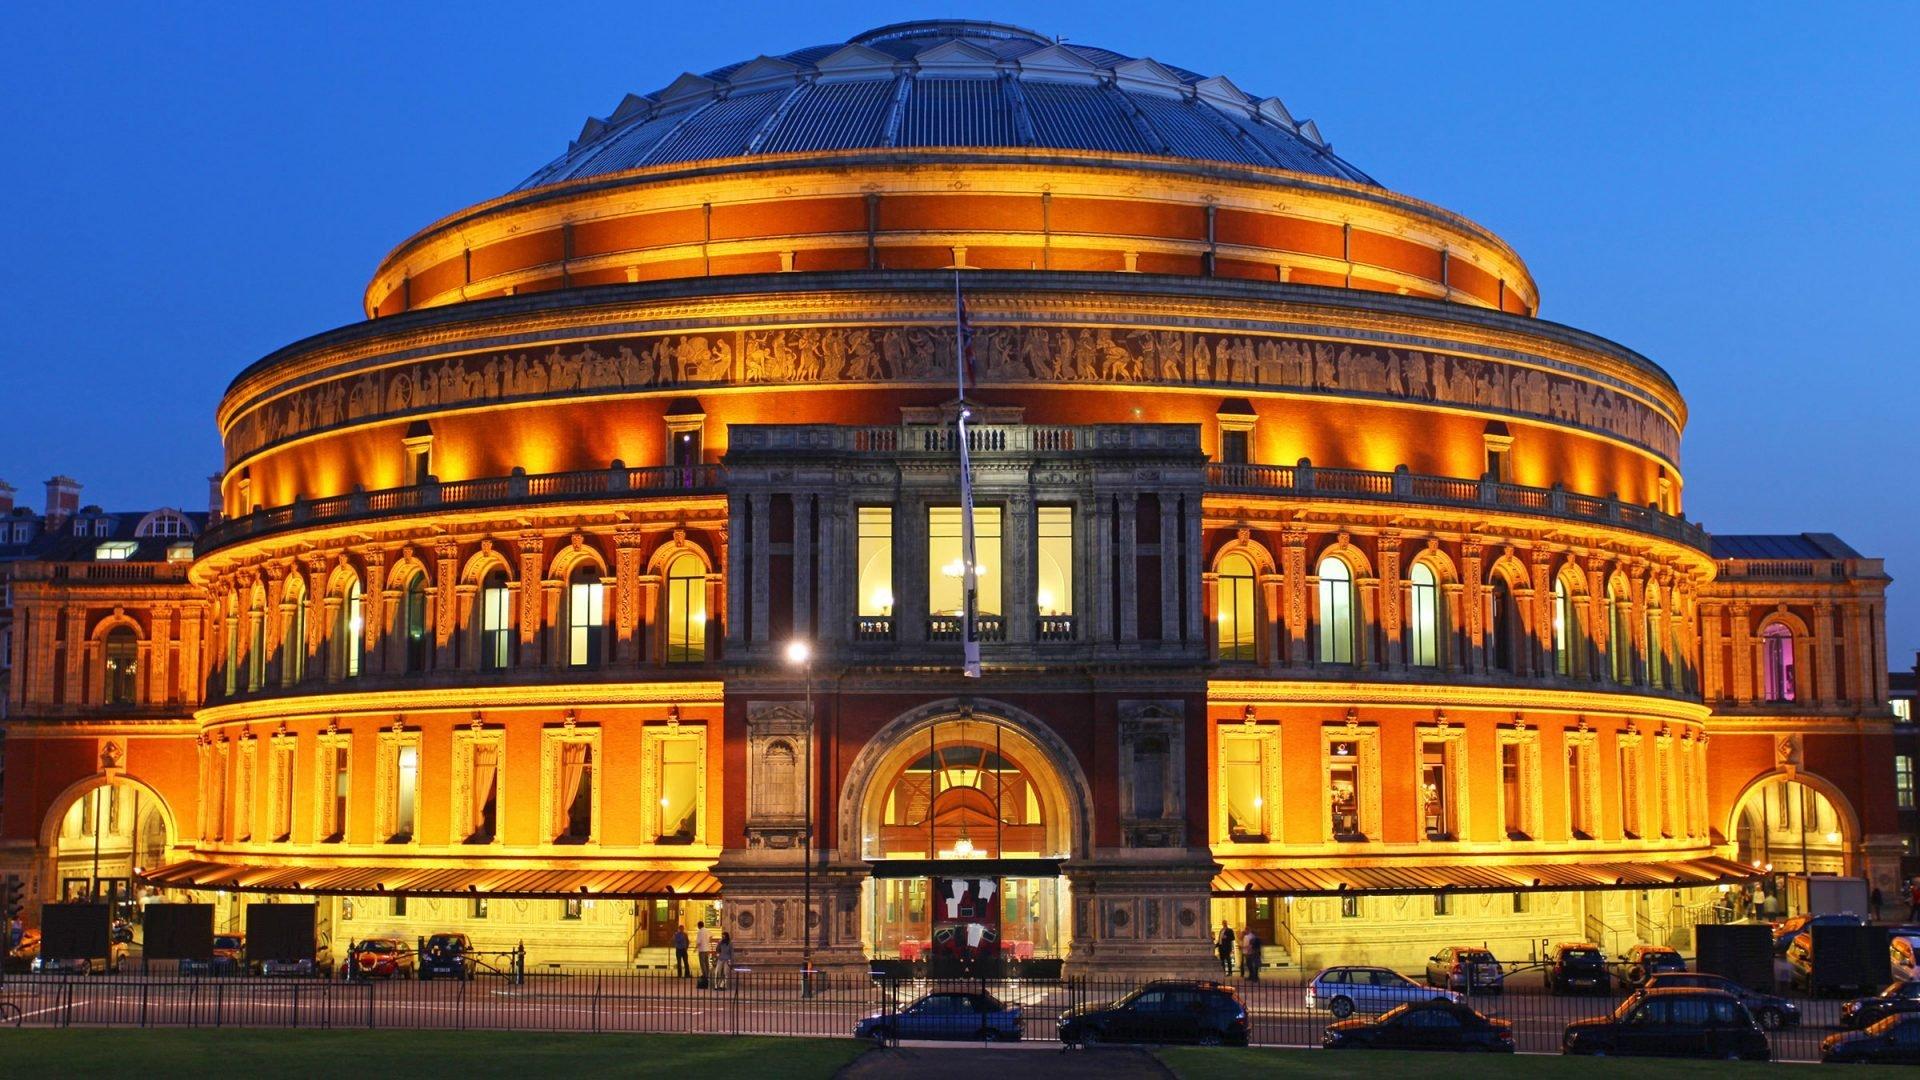 The Royal Albert Hall, London